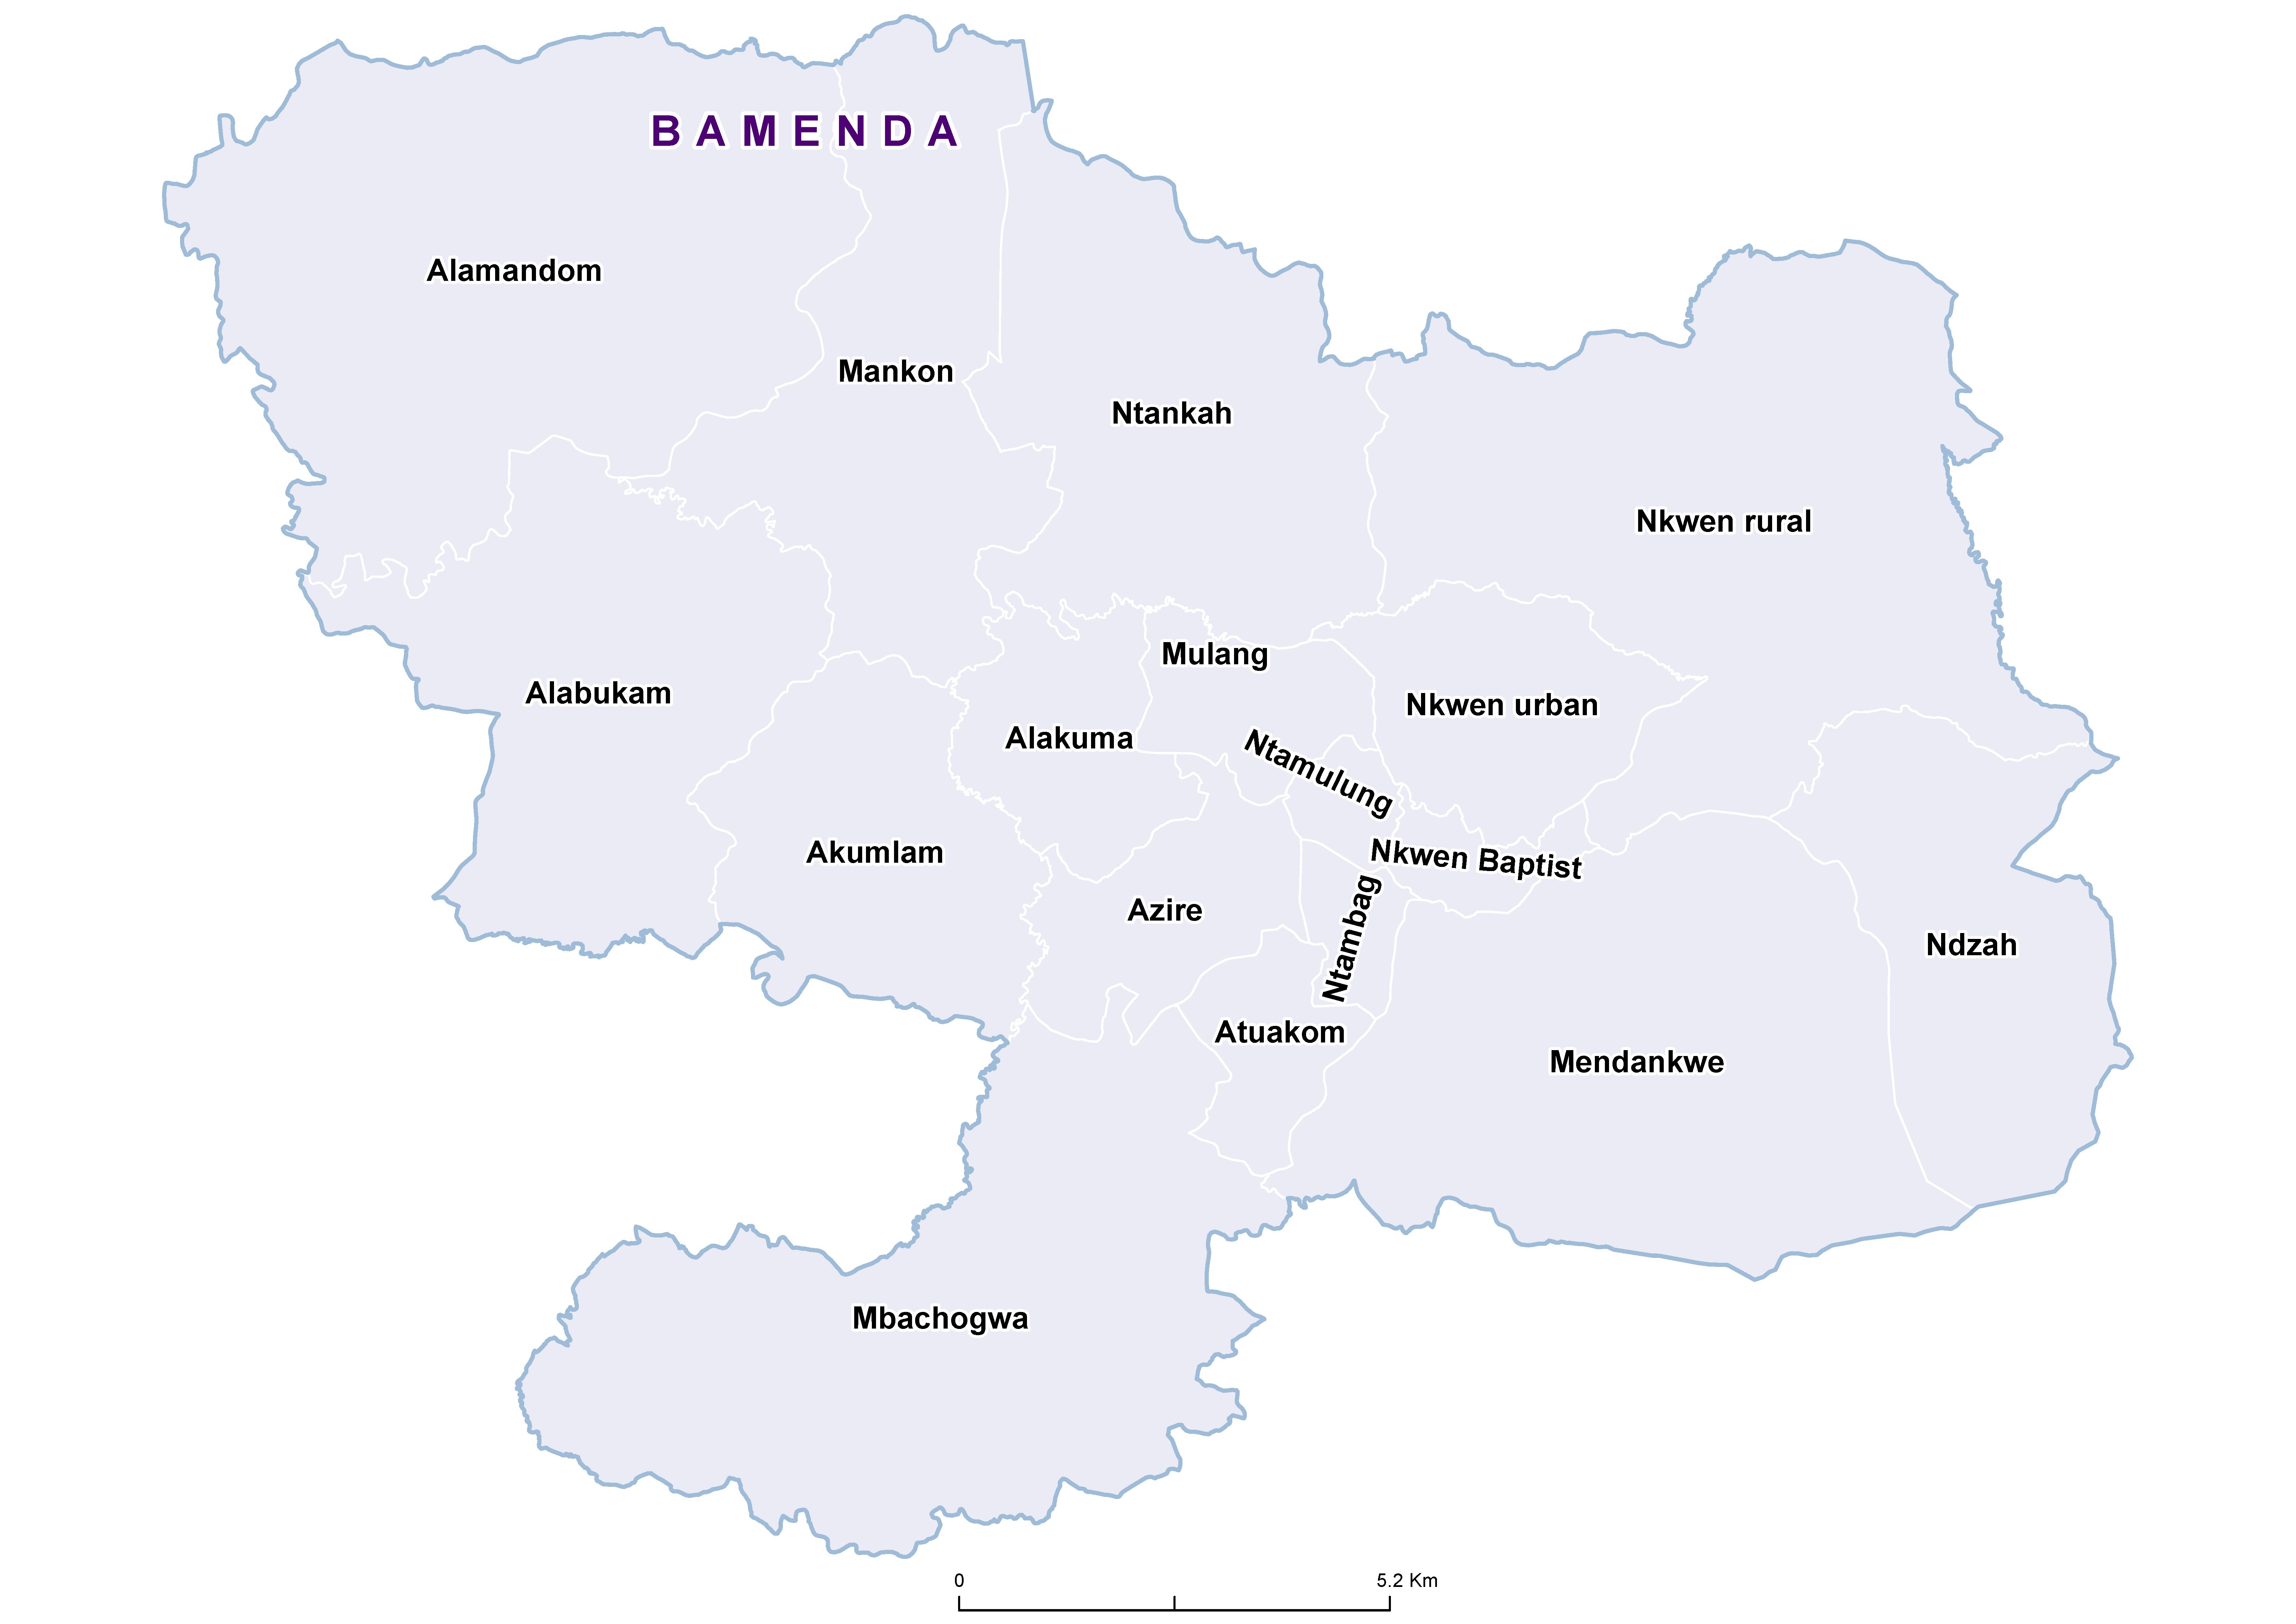 Bamenda STH 19850001